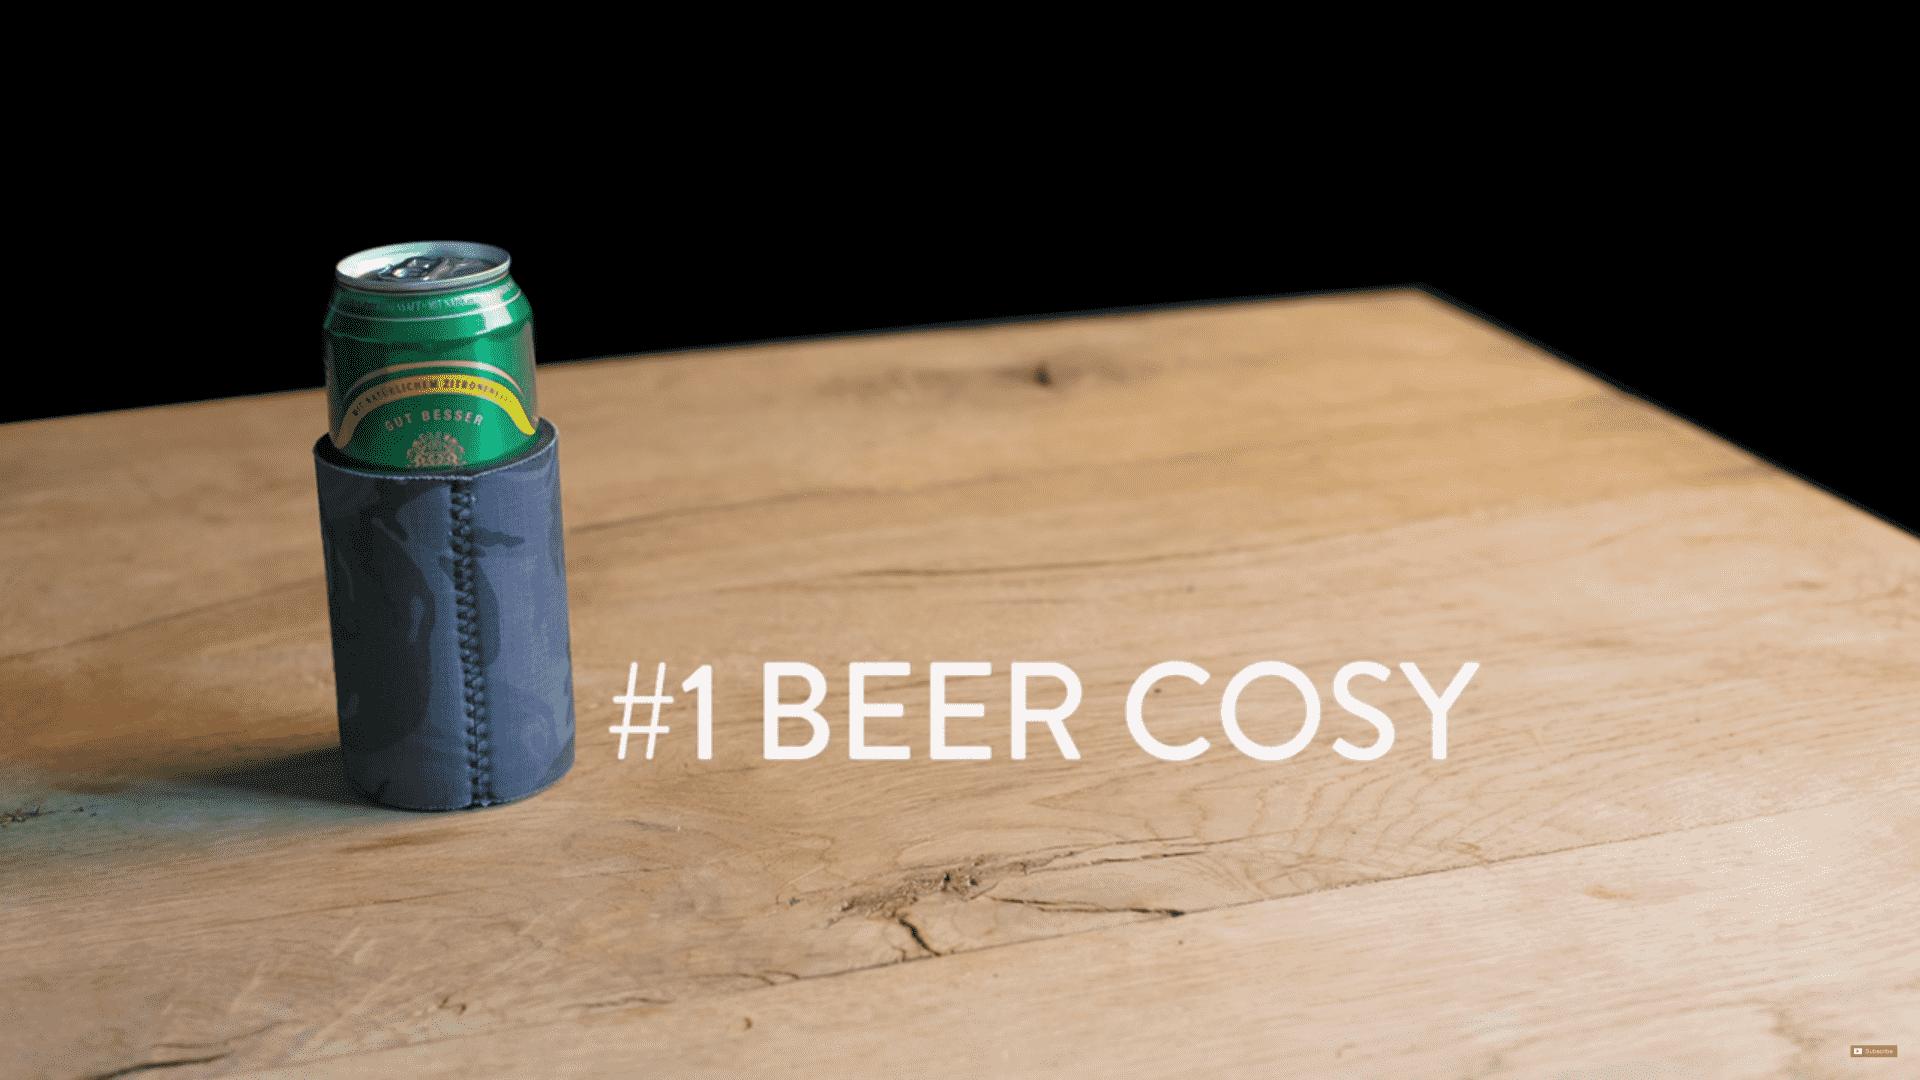 beercosy image